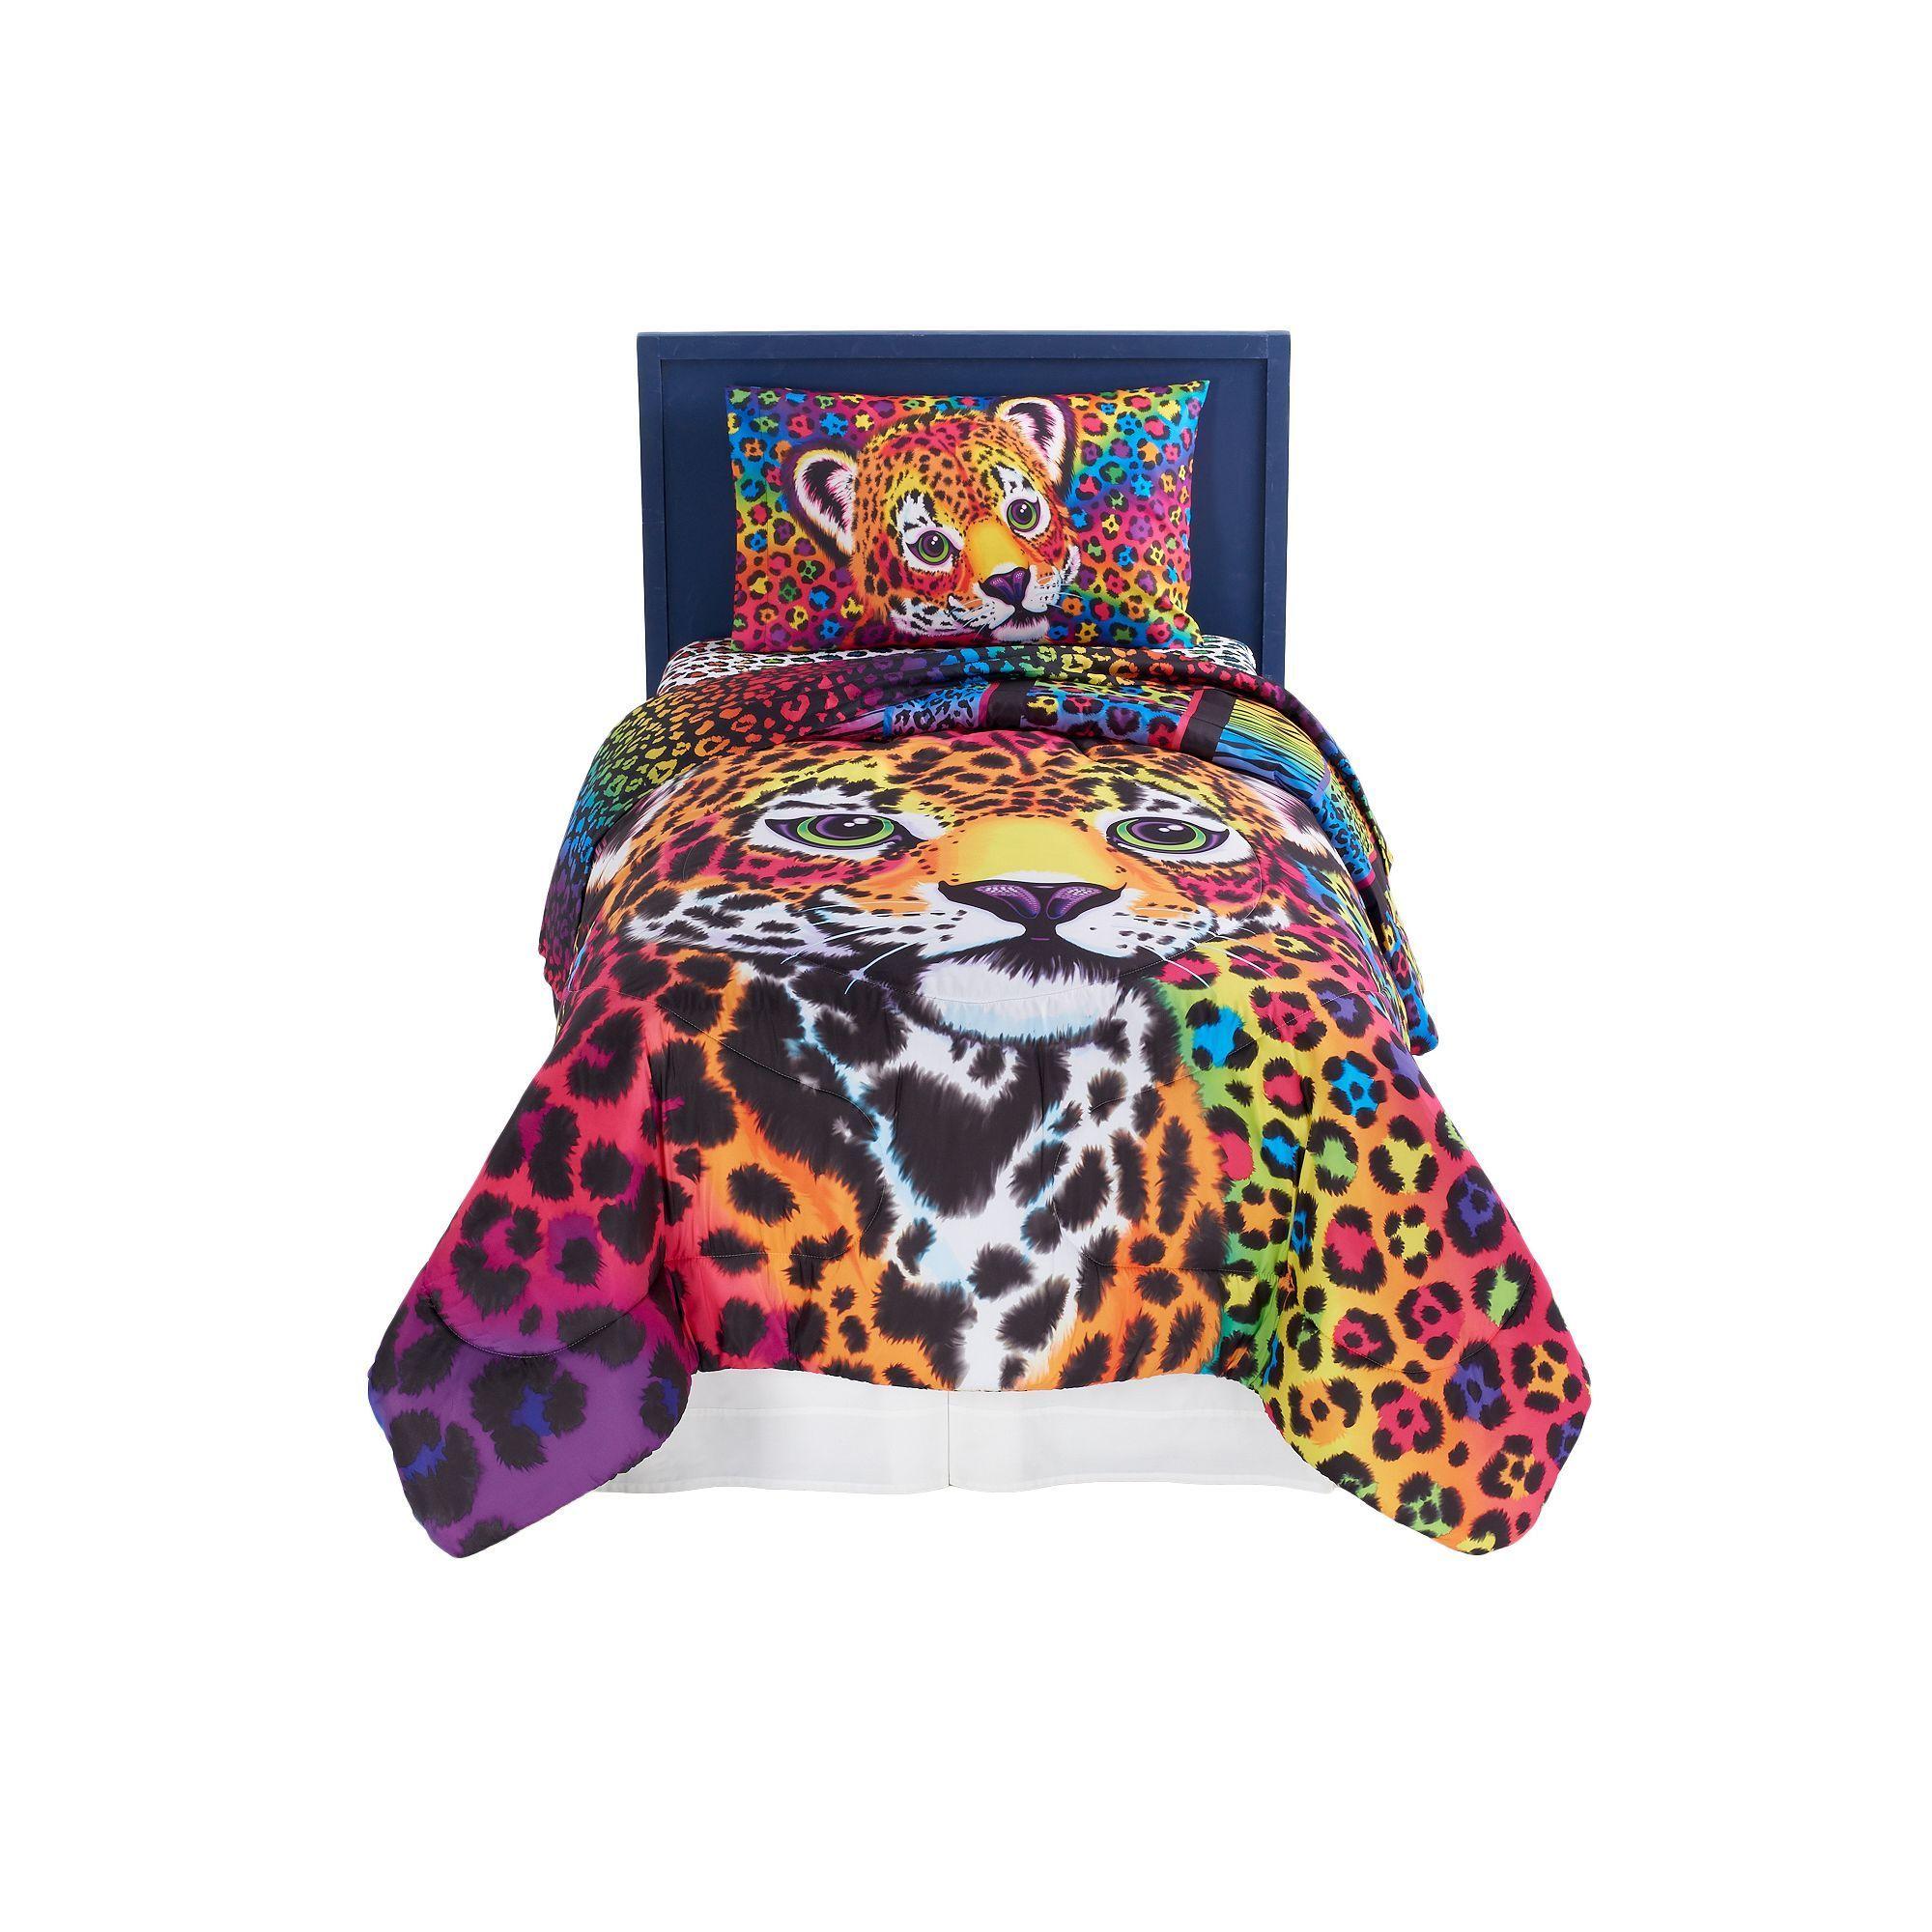 5139ce8d4b8 Lisa Frank Wild Side 4-Piece Bed Set